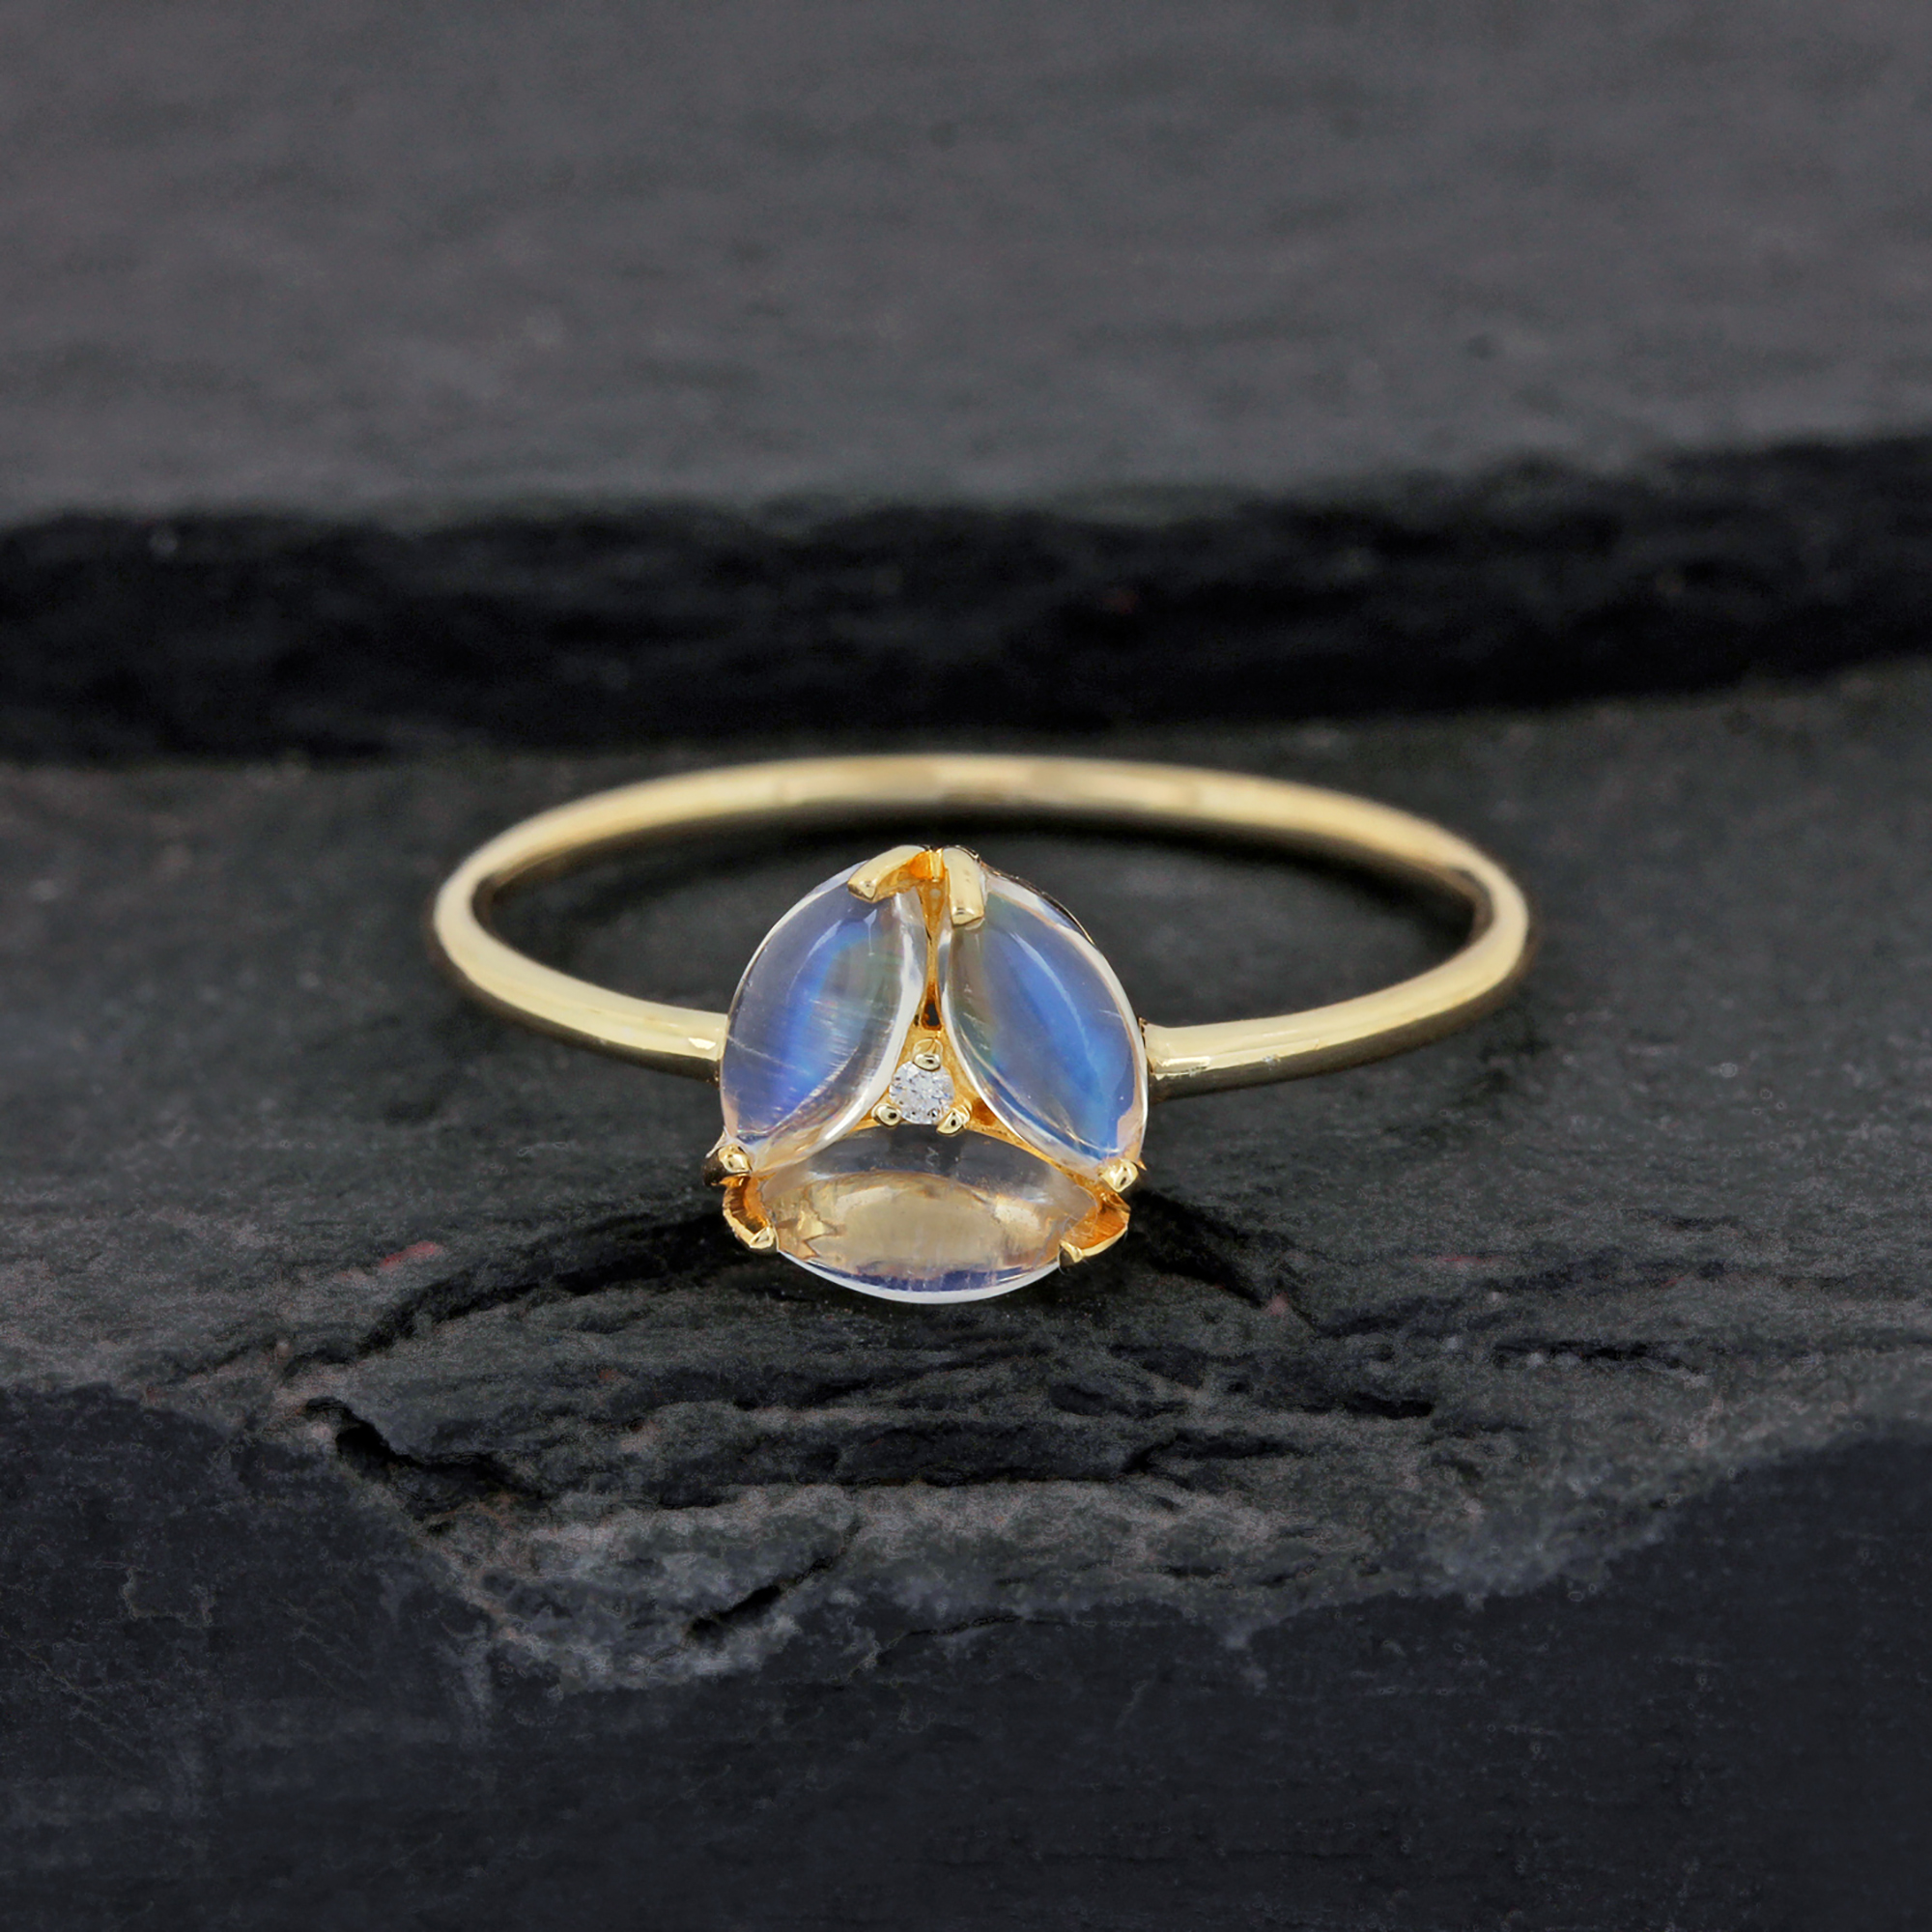 14k Gold Diamond Gemstone Ring